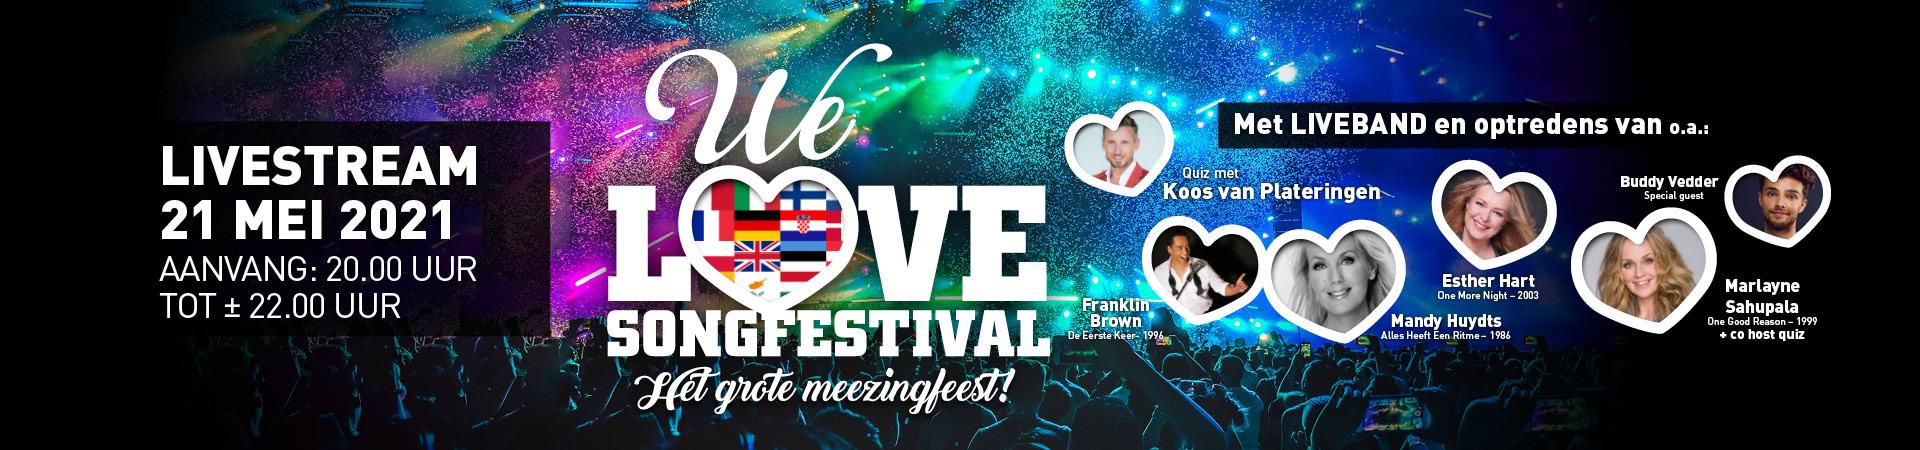 We Love Songfestival Livestream 21-05-2021